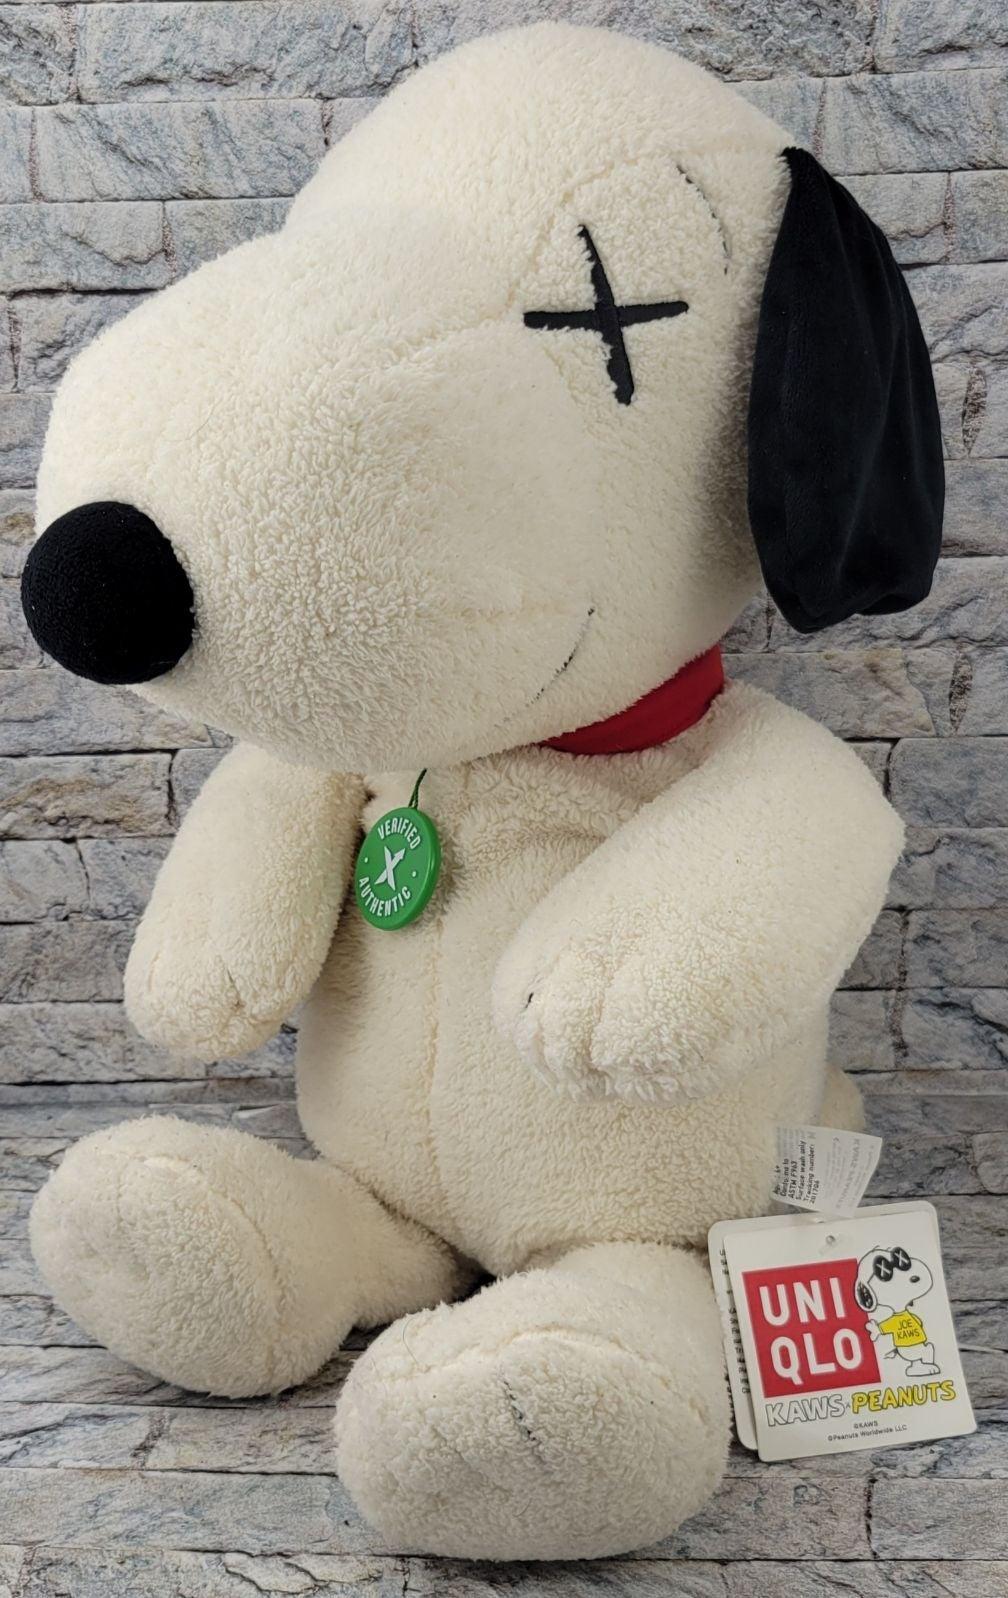 UNIQLO x KAWS Peanuts Snoopy PLUSH TOY